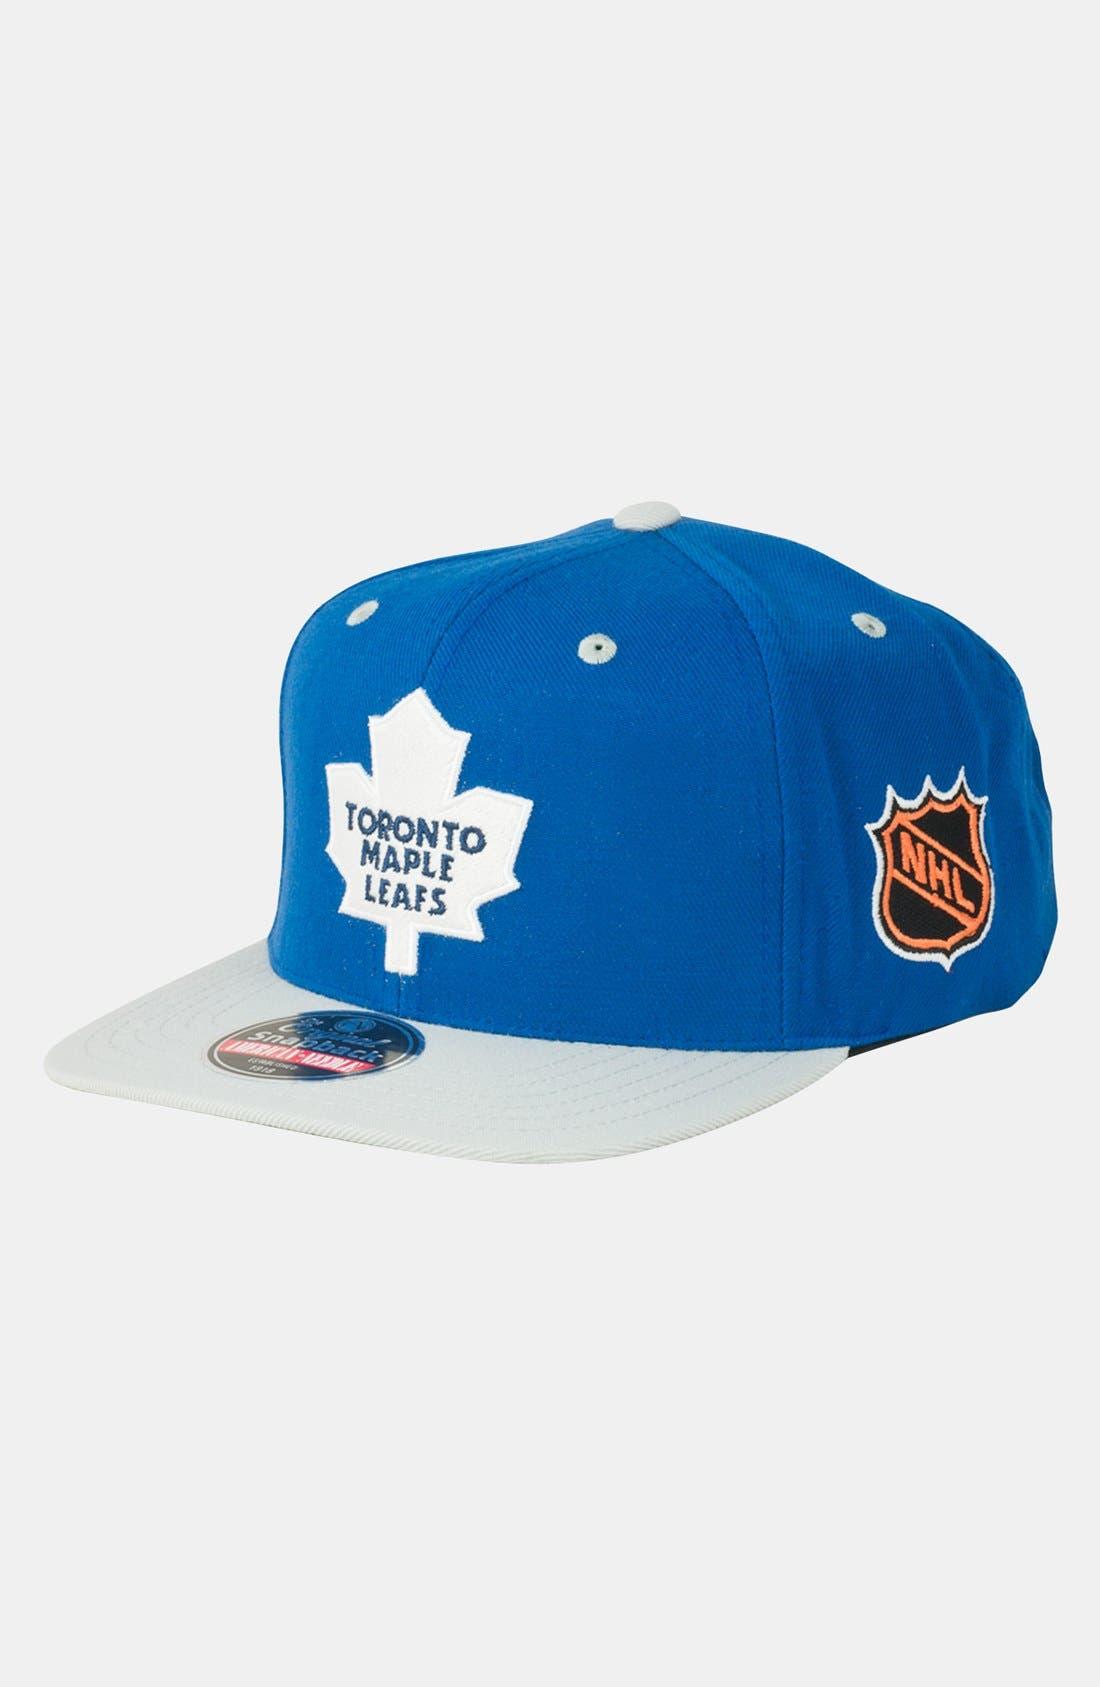 Main Image - American Needle 'Toronto Maple Leafs - Blockhead' Snapback Hockey Cap